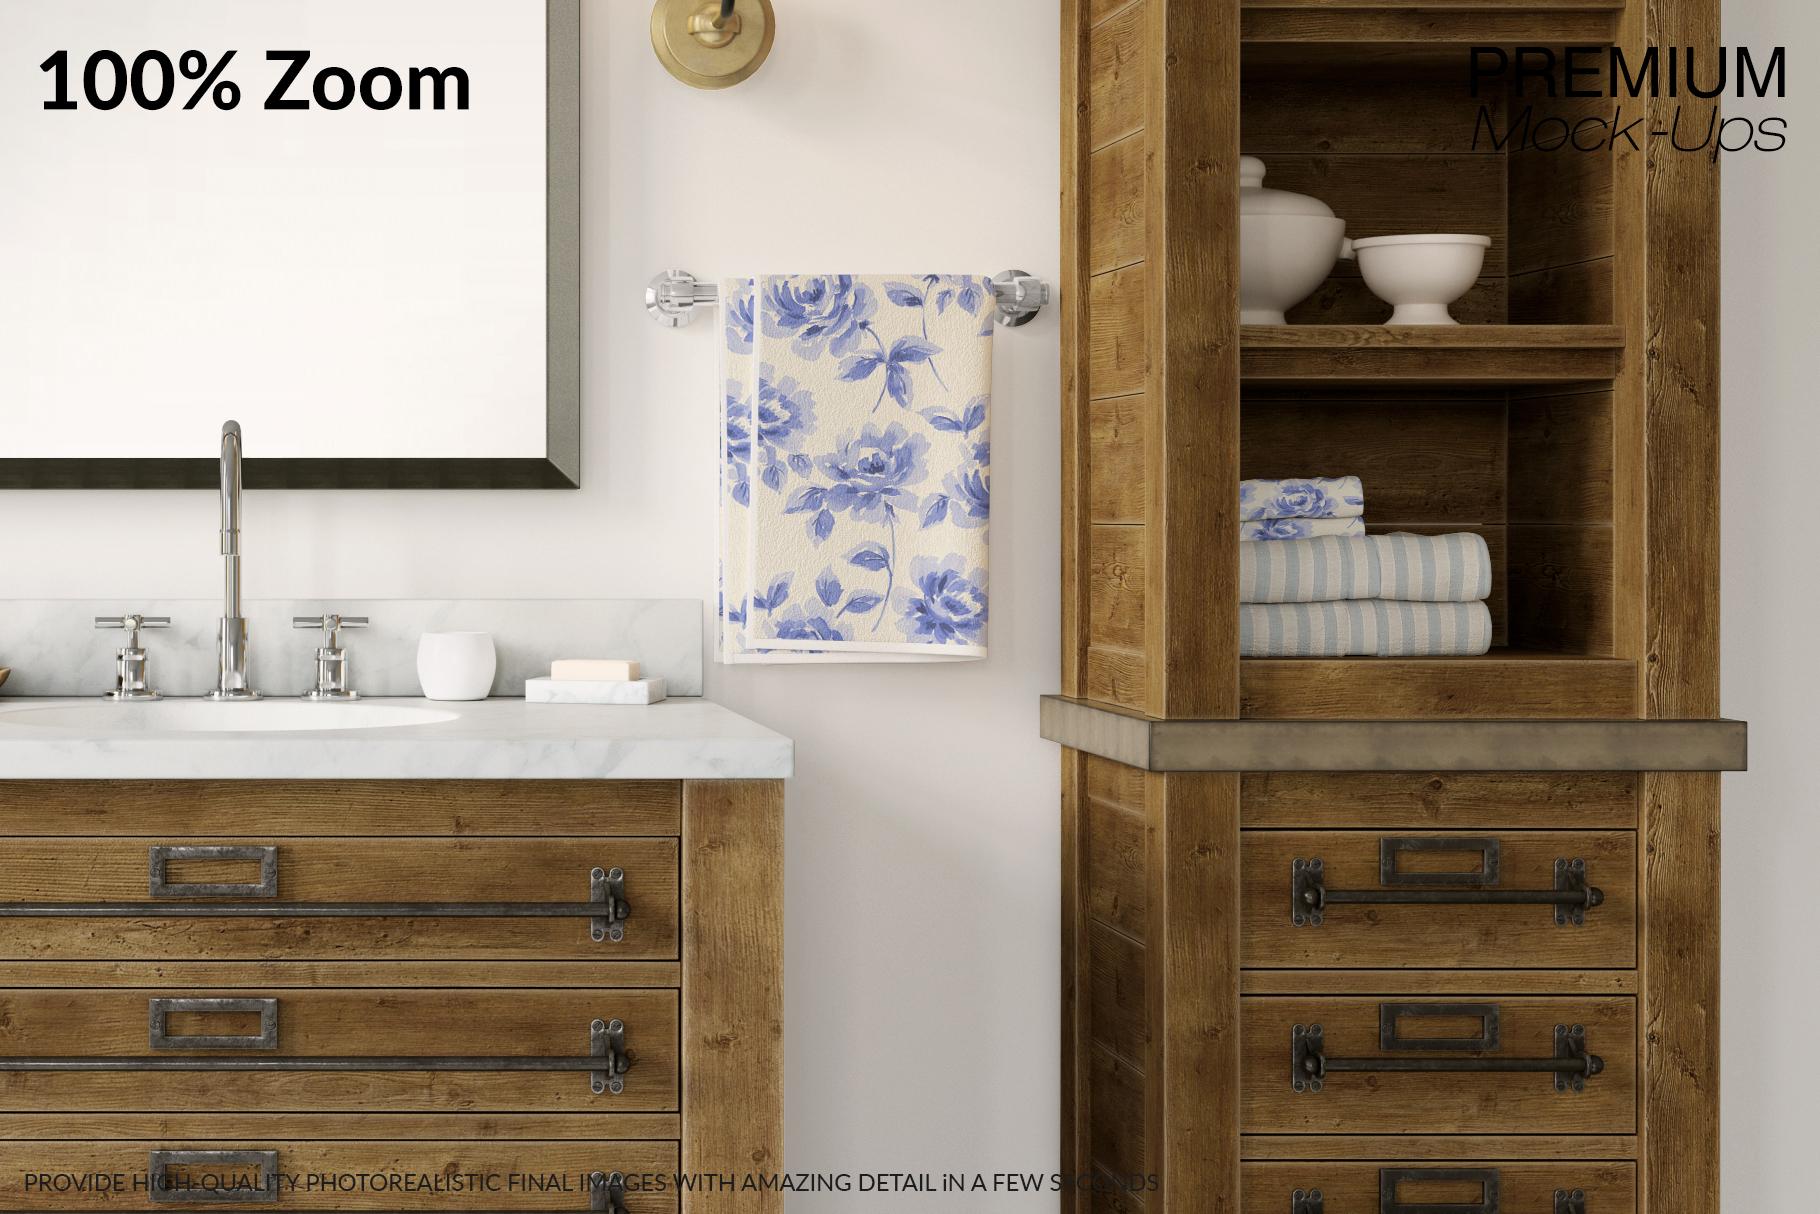 Bath Towels Mockup Set example image 4